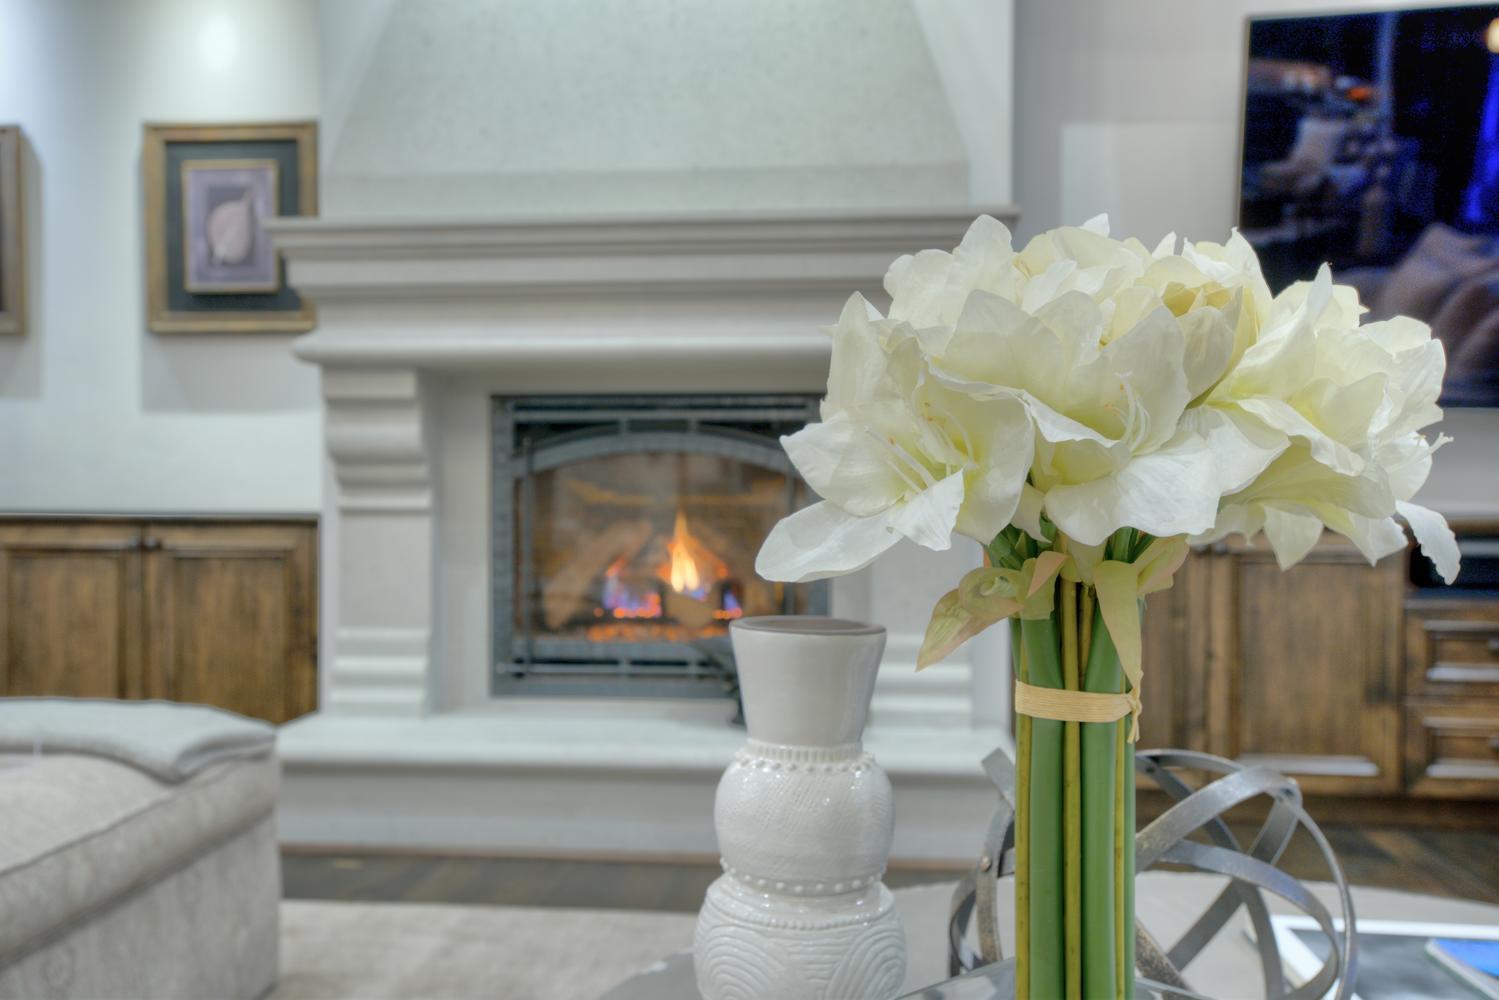 15977 Grandview Dr Monte-large-020-8-Living Room Fireplace-1499x1000-72dpi.jpg